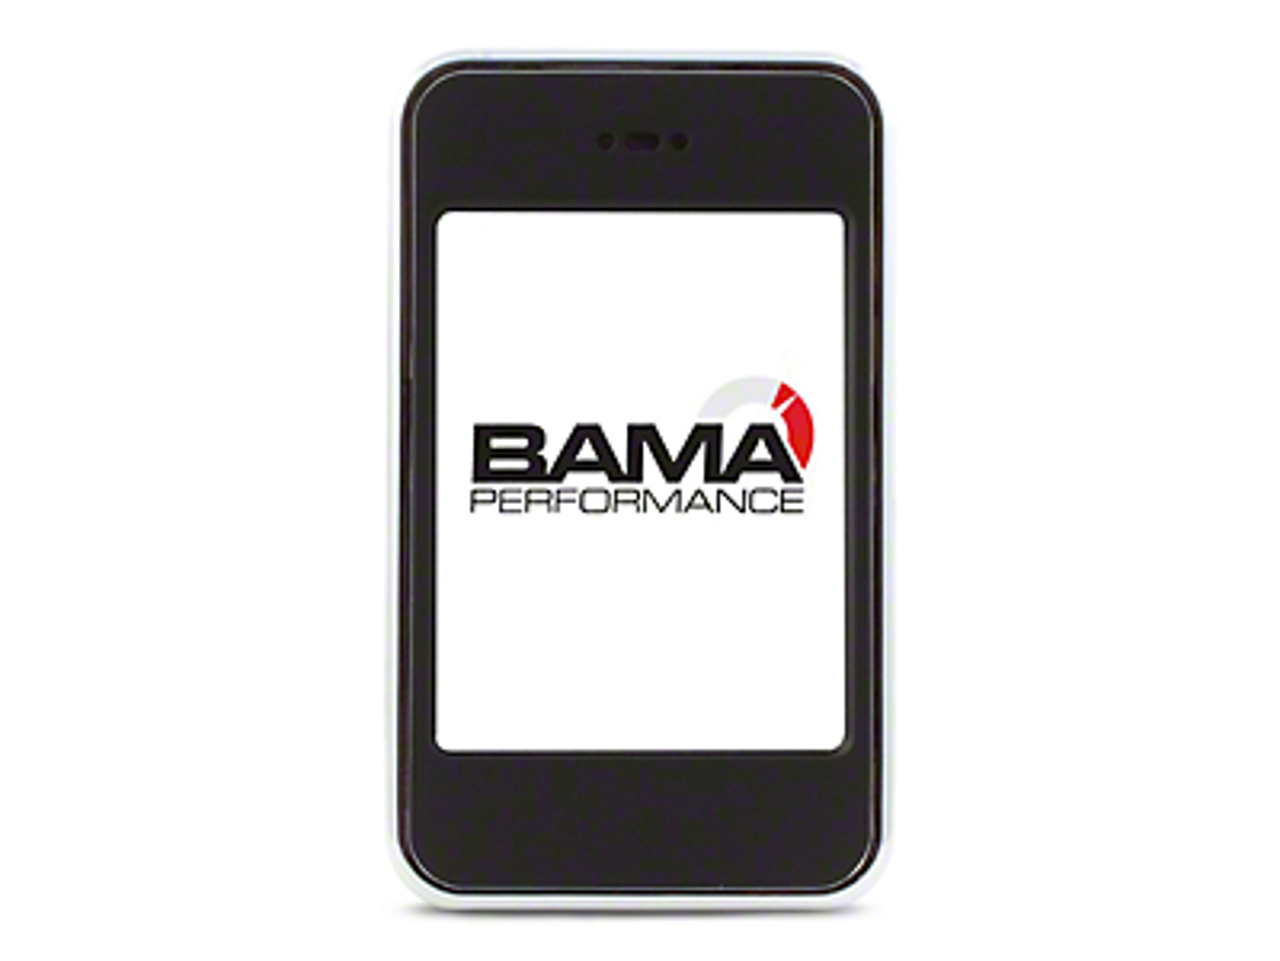 Bama Diablosport inTune i2 Tuner w/ 2 Custom Tunes (15-17 V6)